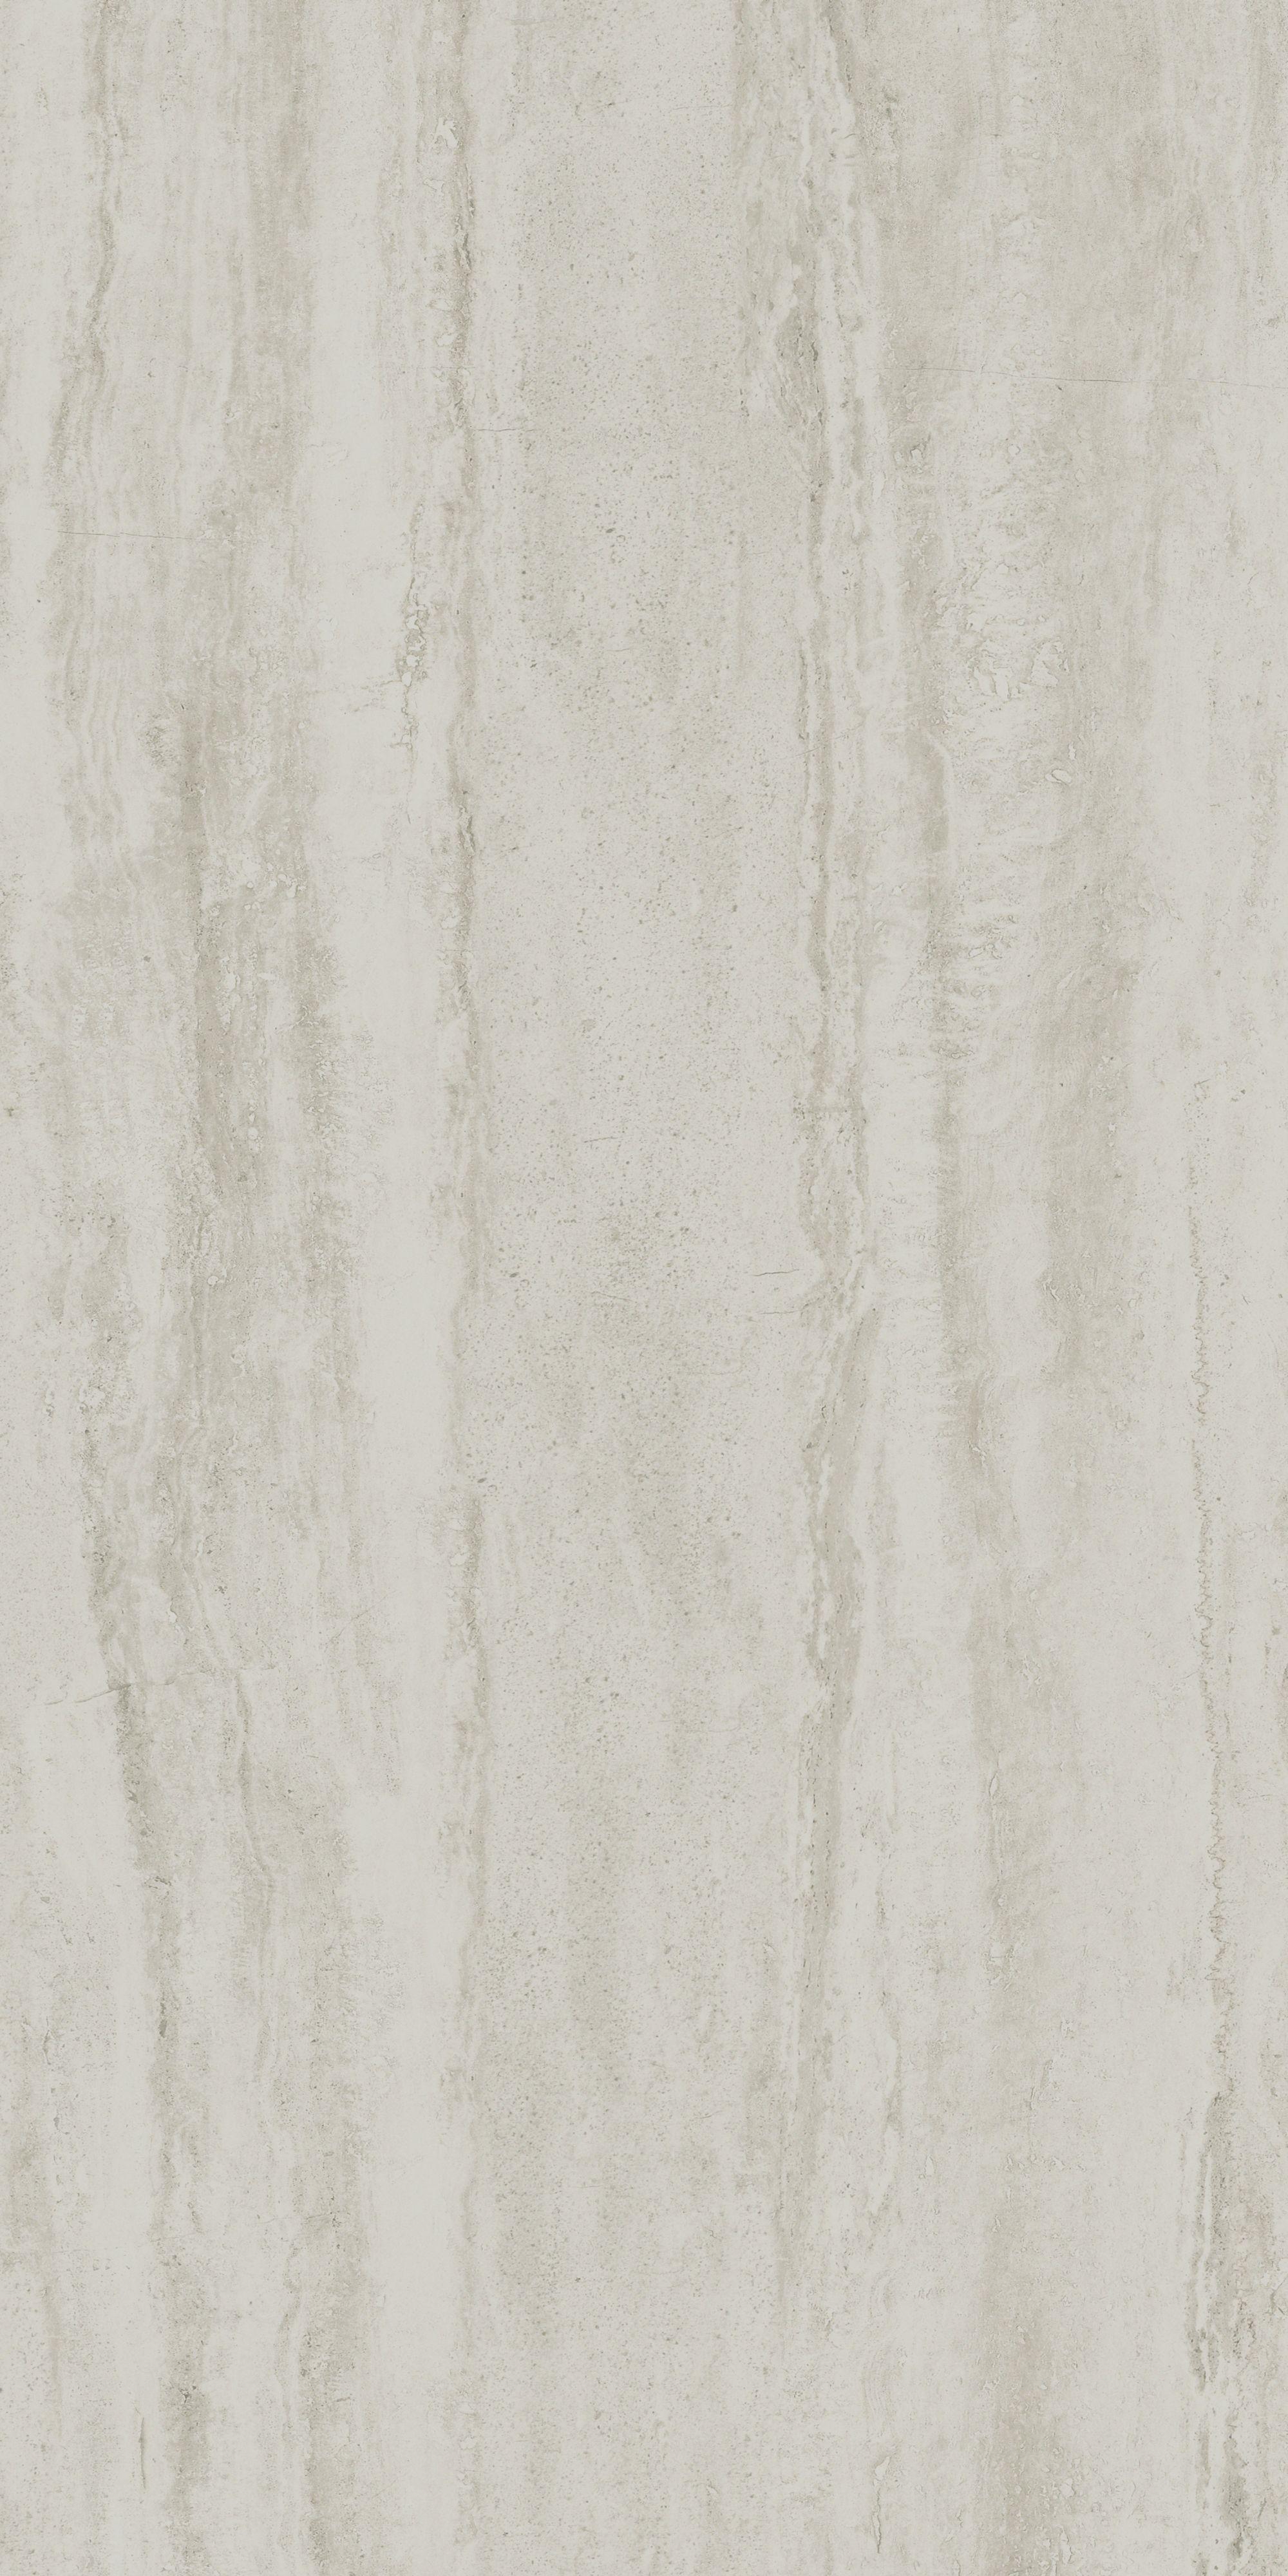 Anatolia Ivory Stone Effect Plain Porcelain Wall & Floor Tile, Pack ...